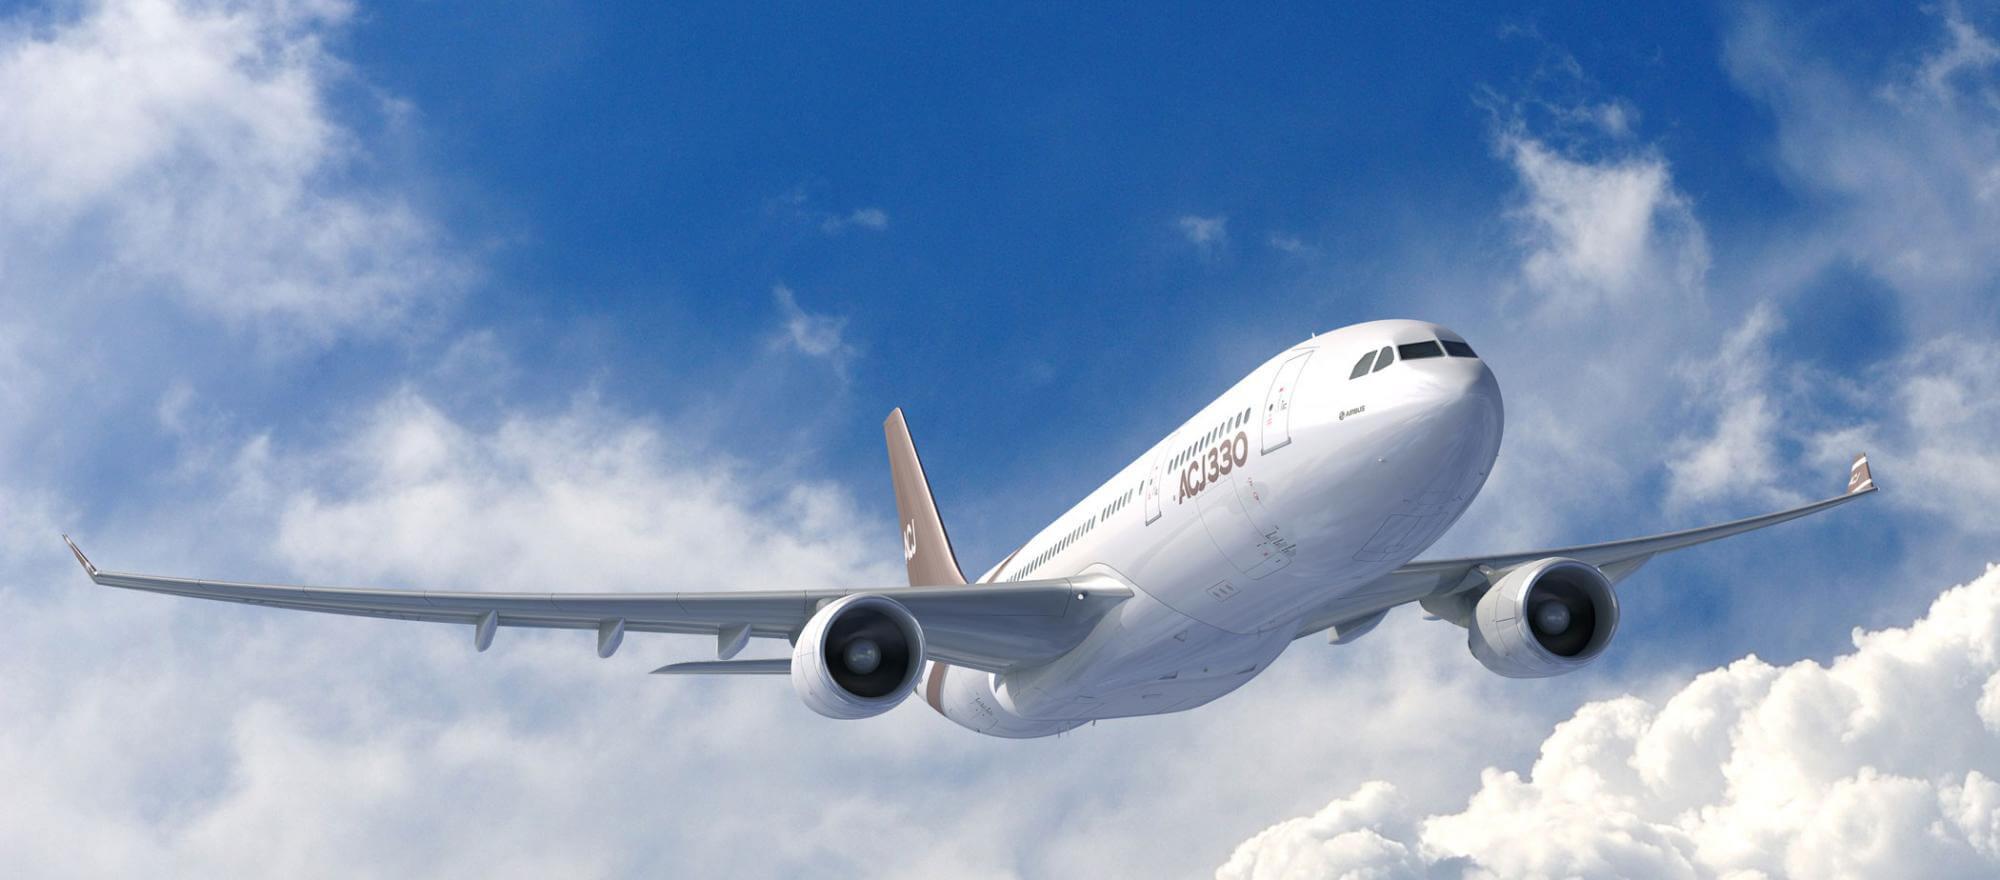 airbus acj330 aircraft